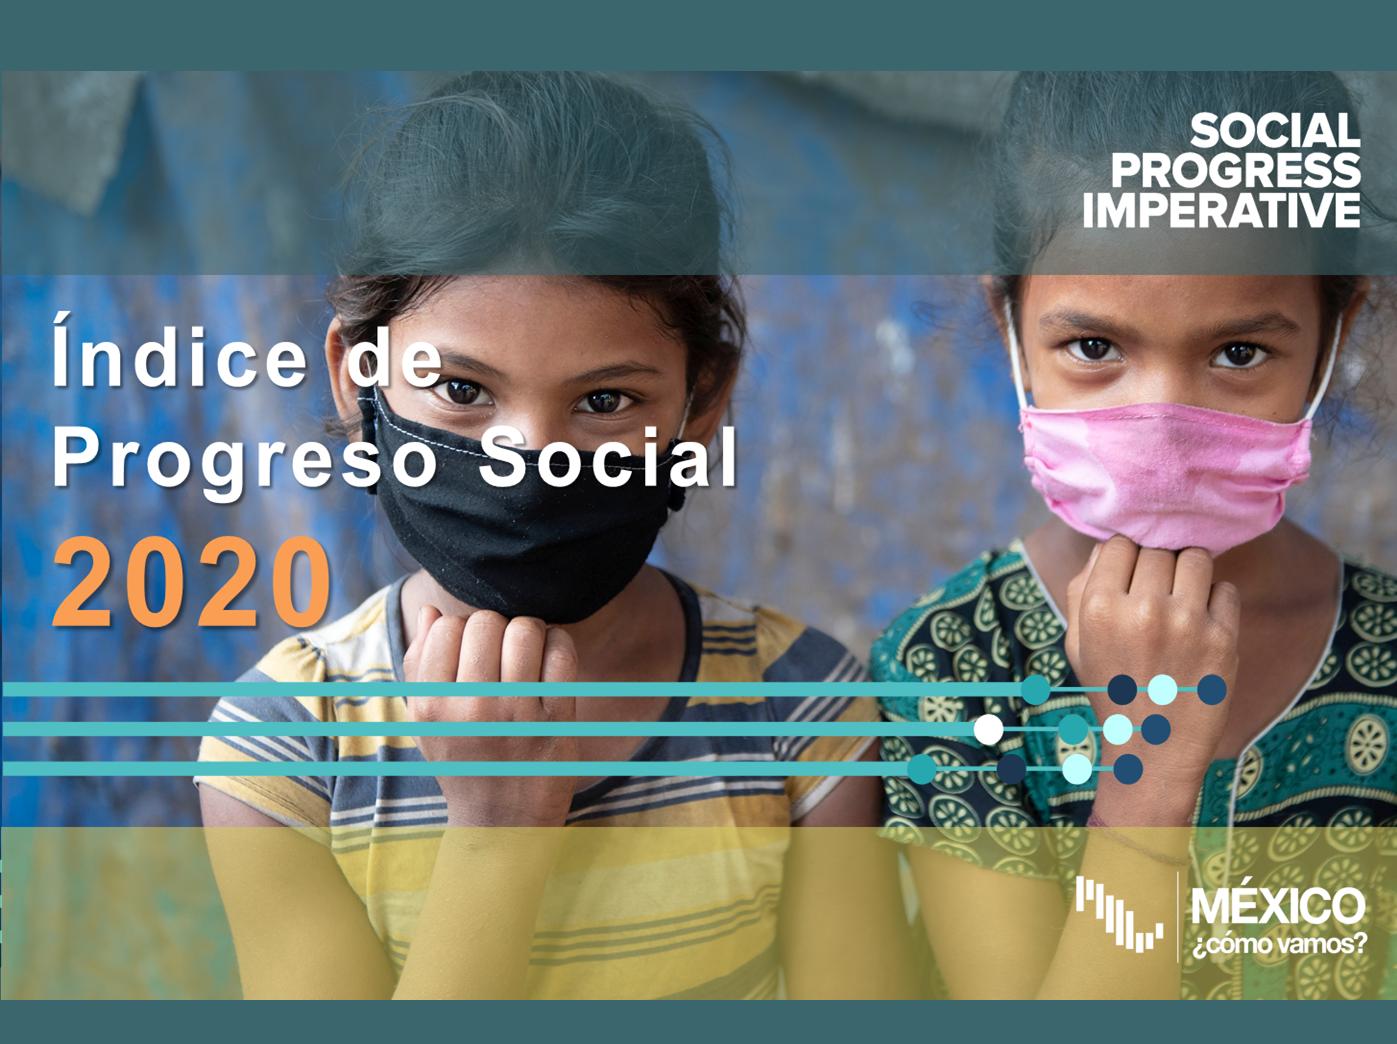 Índice de Progreso Social Global 2020